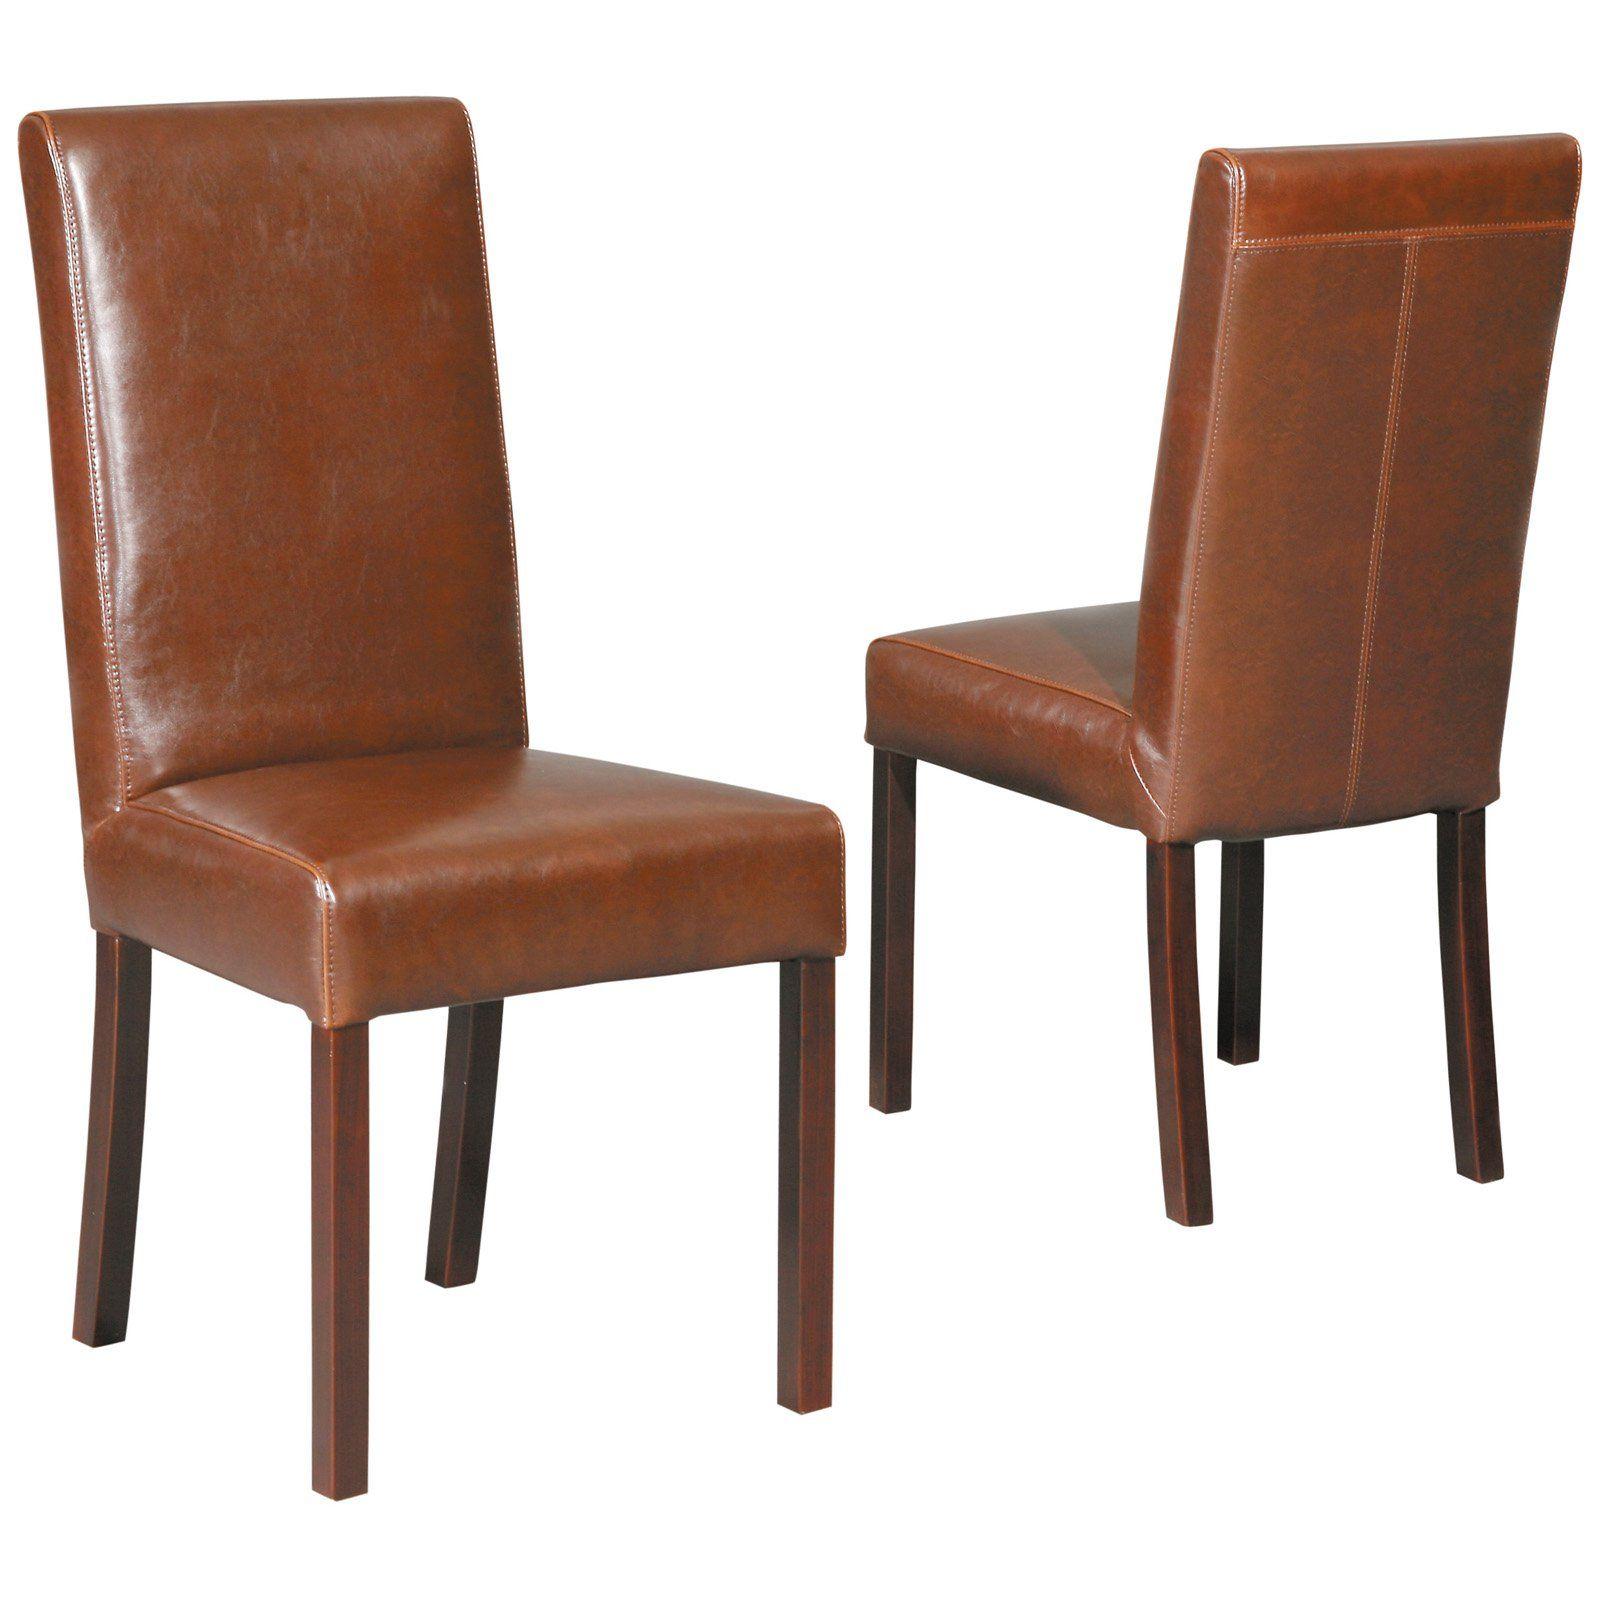 Leder Parsons Stühle Esszimmerstühle Esszimmerstühle Pinterest